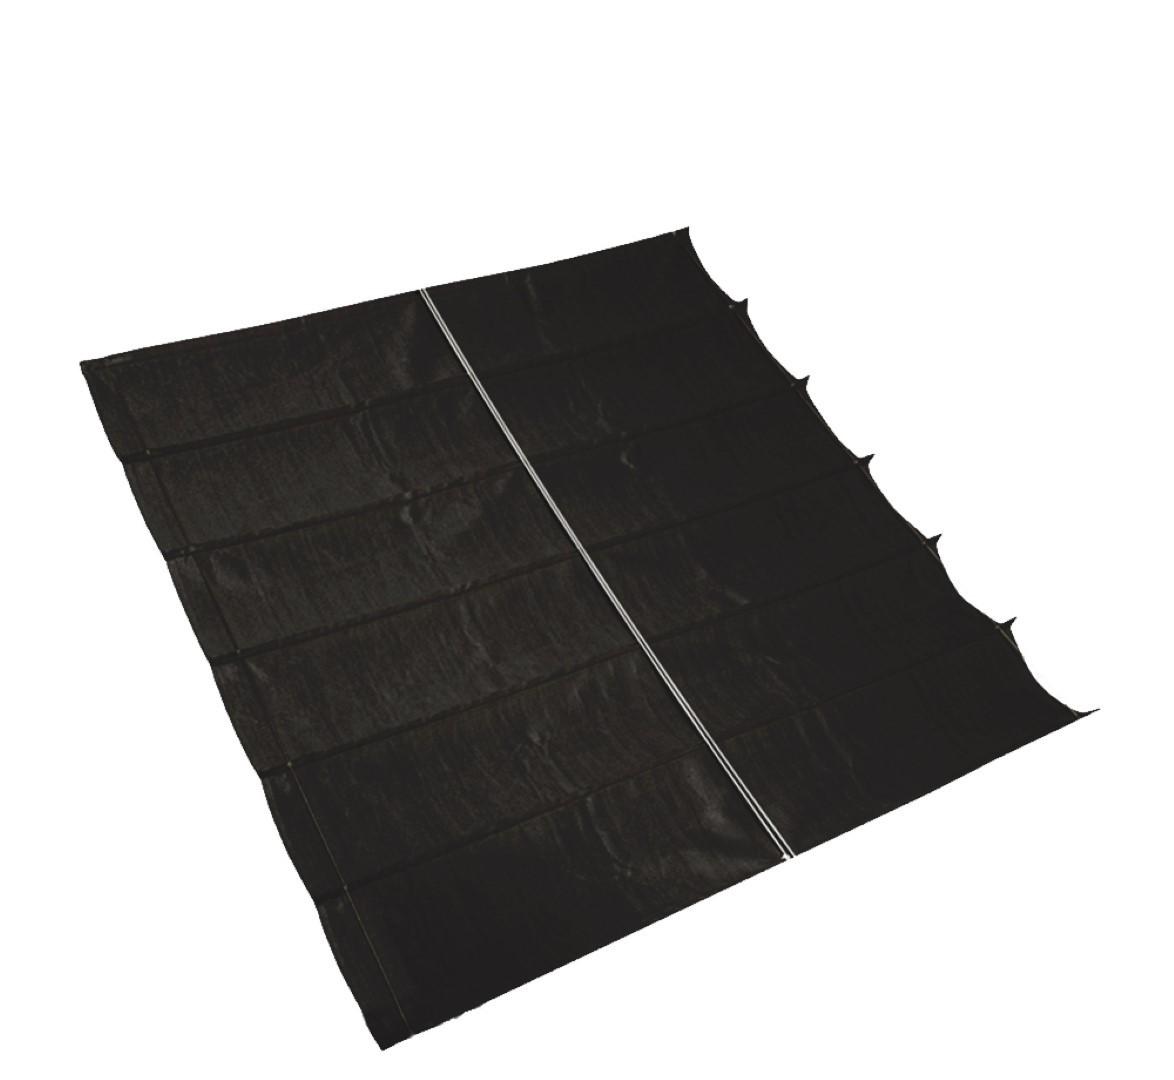 Harmonica schaduwdoek, B 2,9m L 4,0m, Zwart